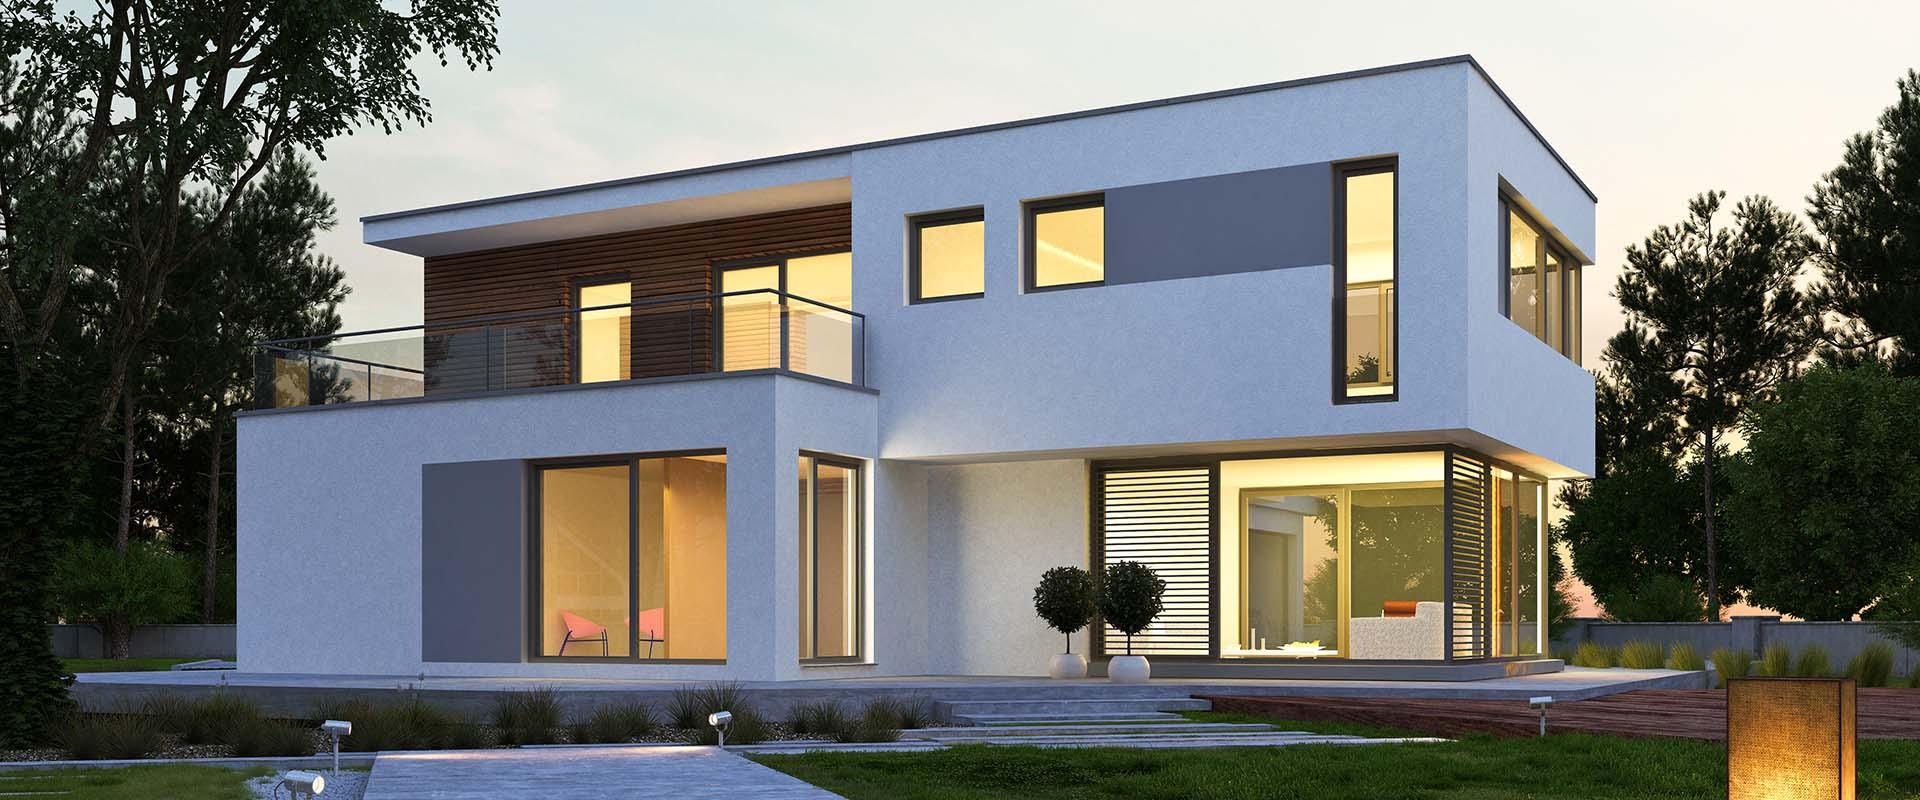 massivhaus berlin bungalow stadtvilla einfamilienhaus. Black Bedroom Furniture Sets. Home Design Ideas